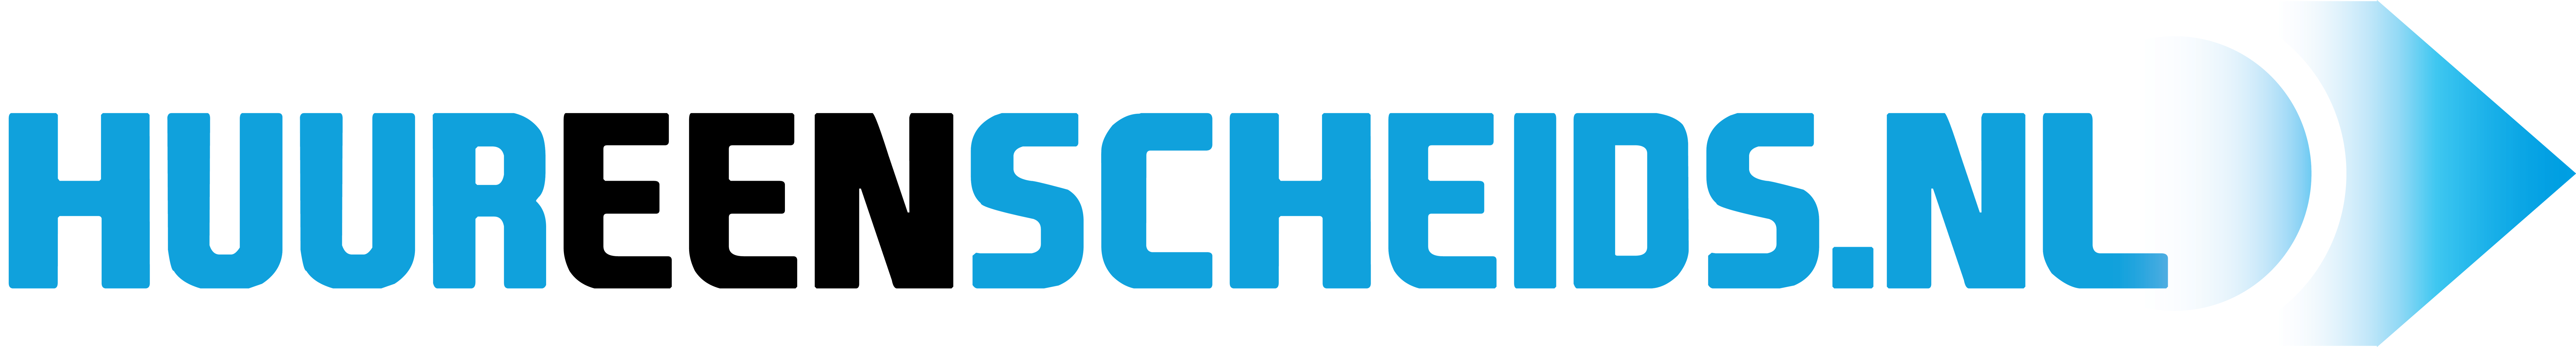 ScheidsGezocht.nl